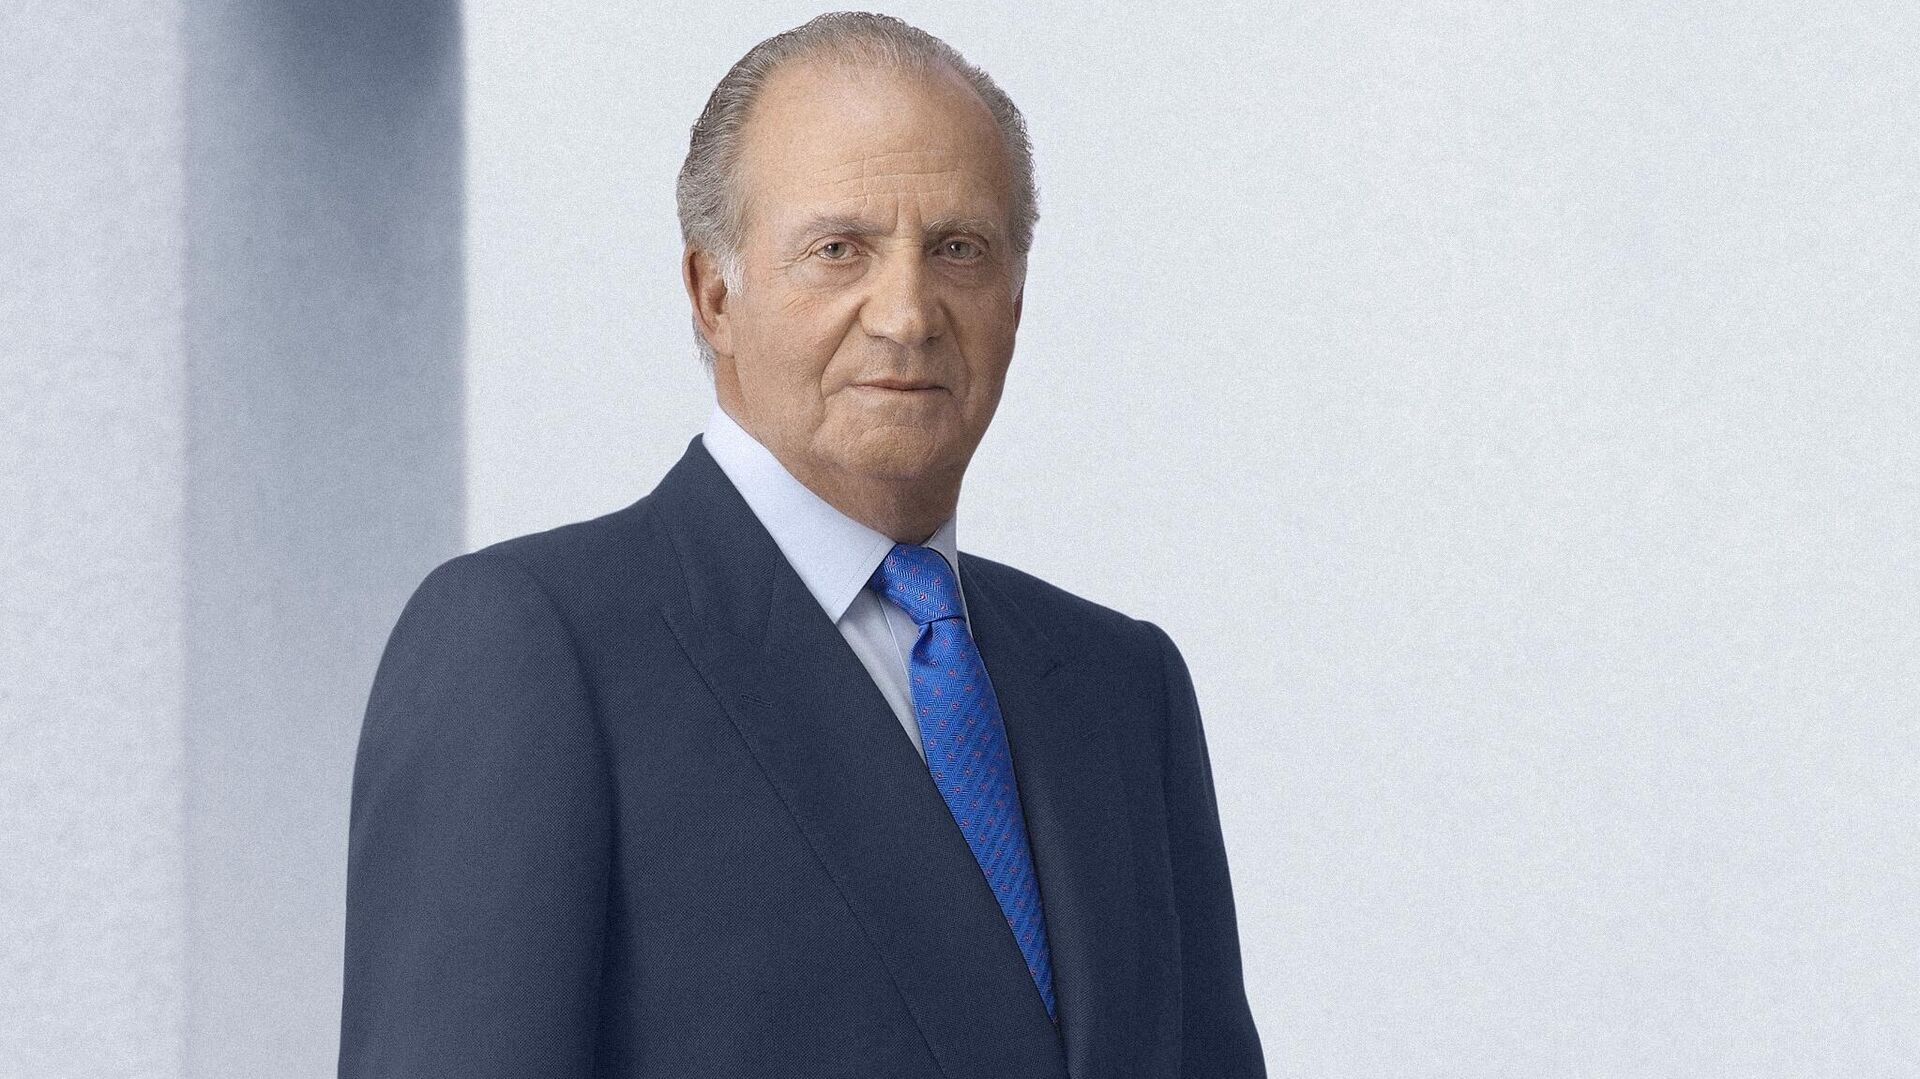 El rey emérito de España Juan Carlos I - Sputnik Mundo, 1920, 25.06.2021